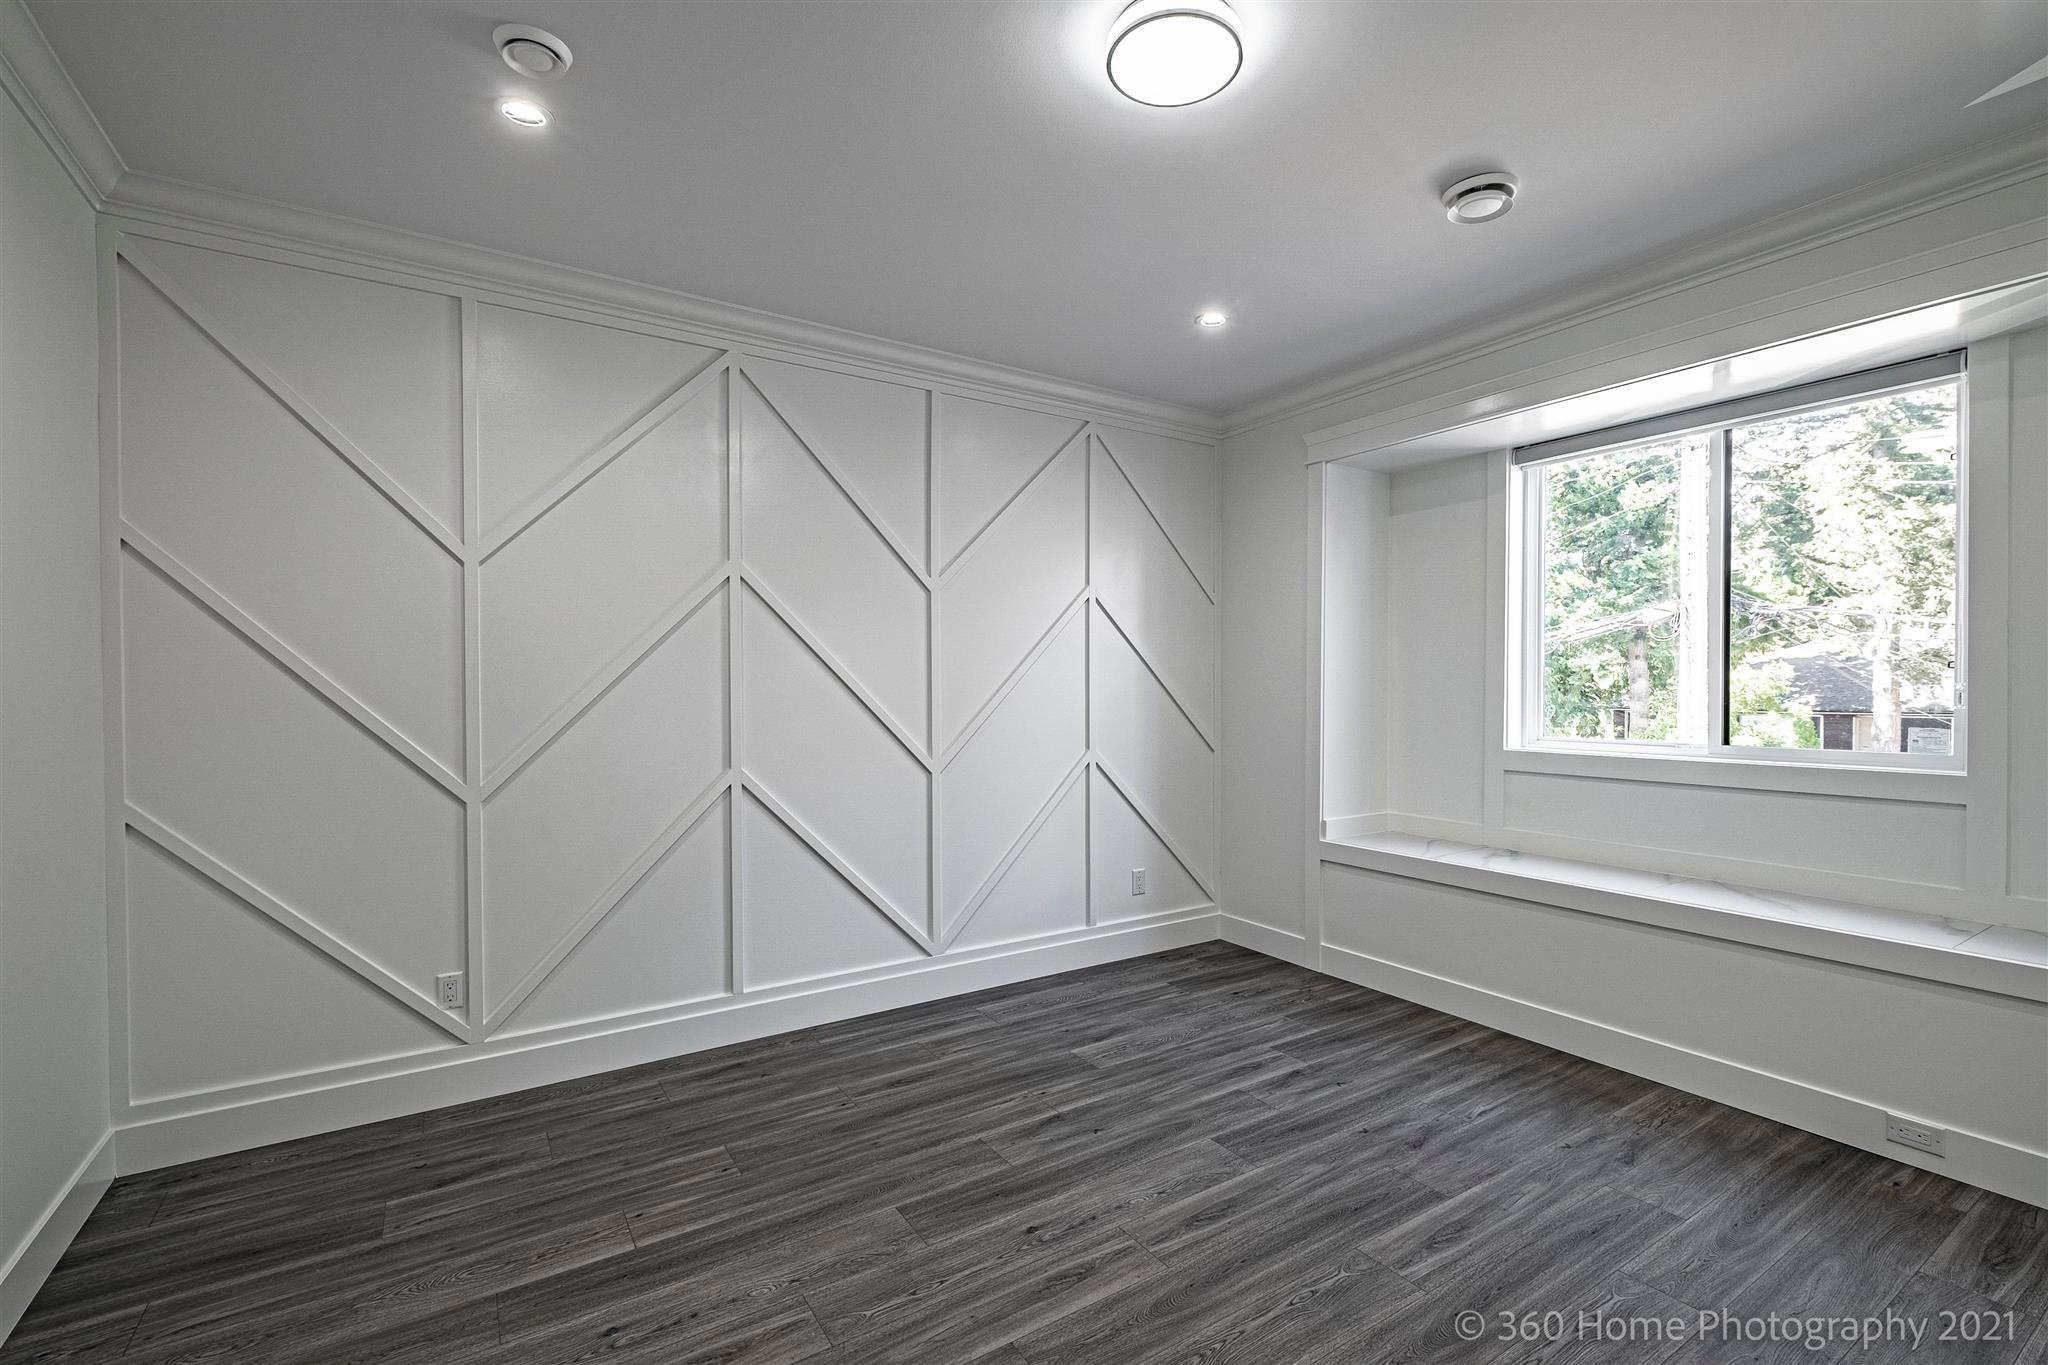 13050 101B AVENUE - Cedar Hills House/Single Family for sale, 5 Bedrooms (R2602208) - #20